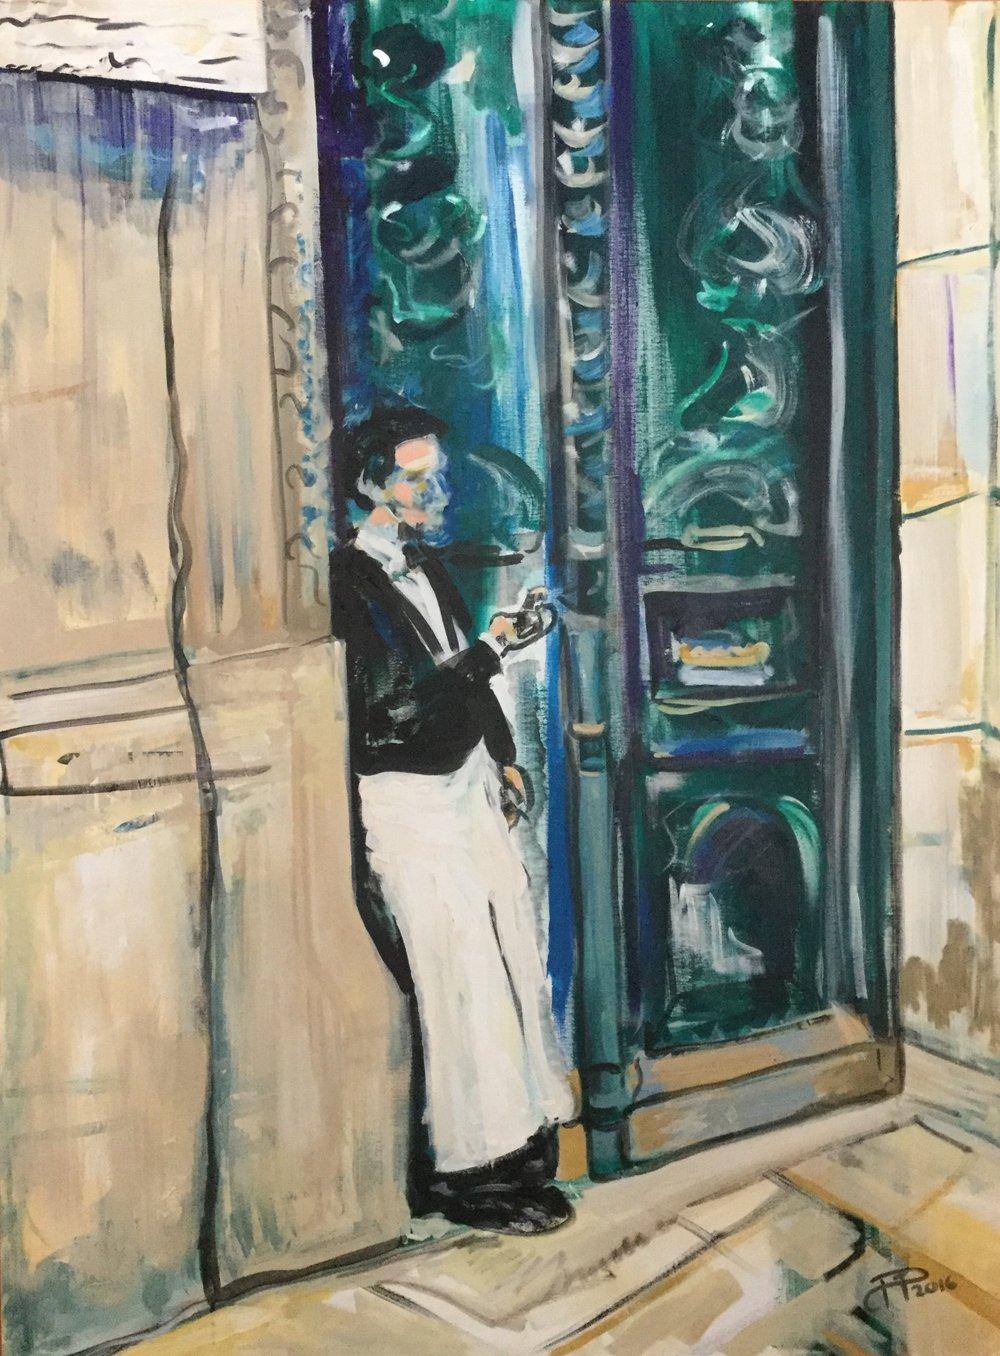 Parisian Waiter on Break